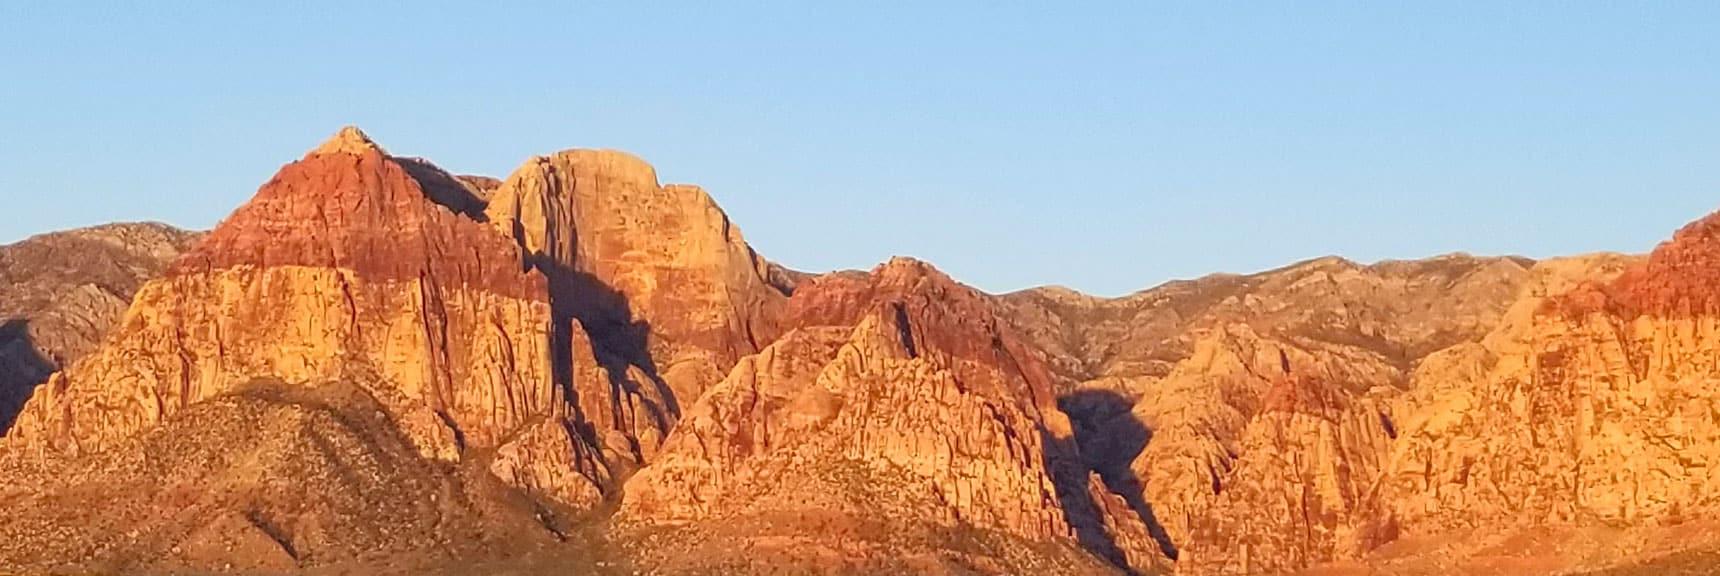 Juniper Peak, Red Rock National Park, Nevada